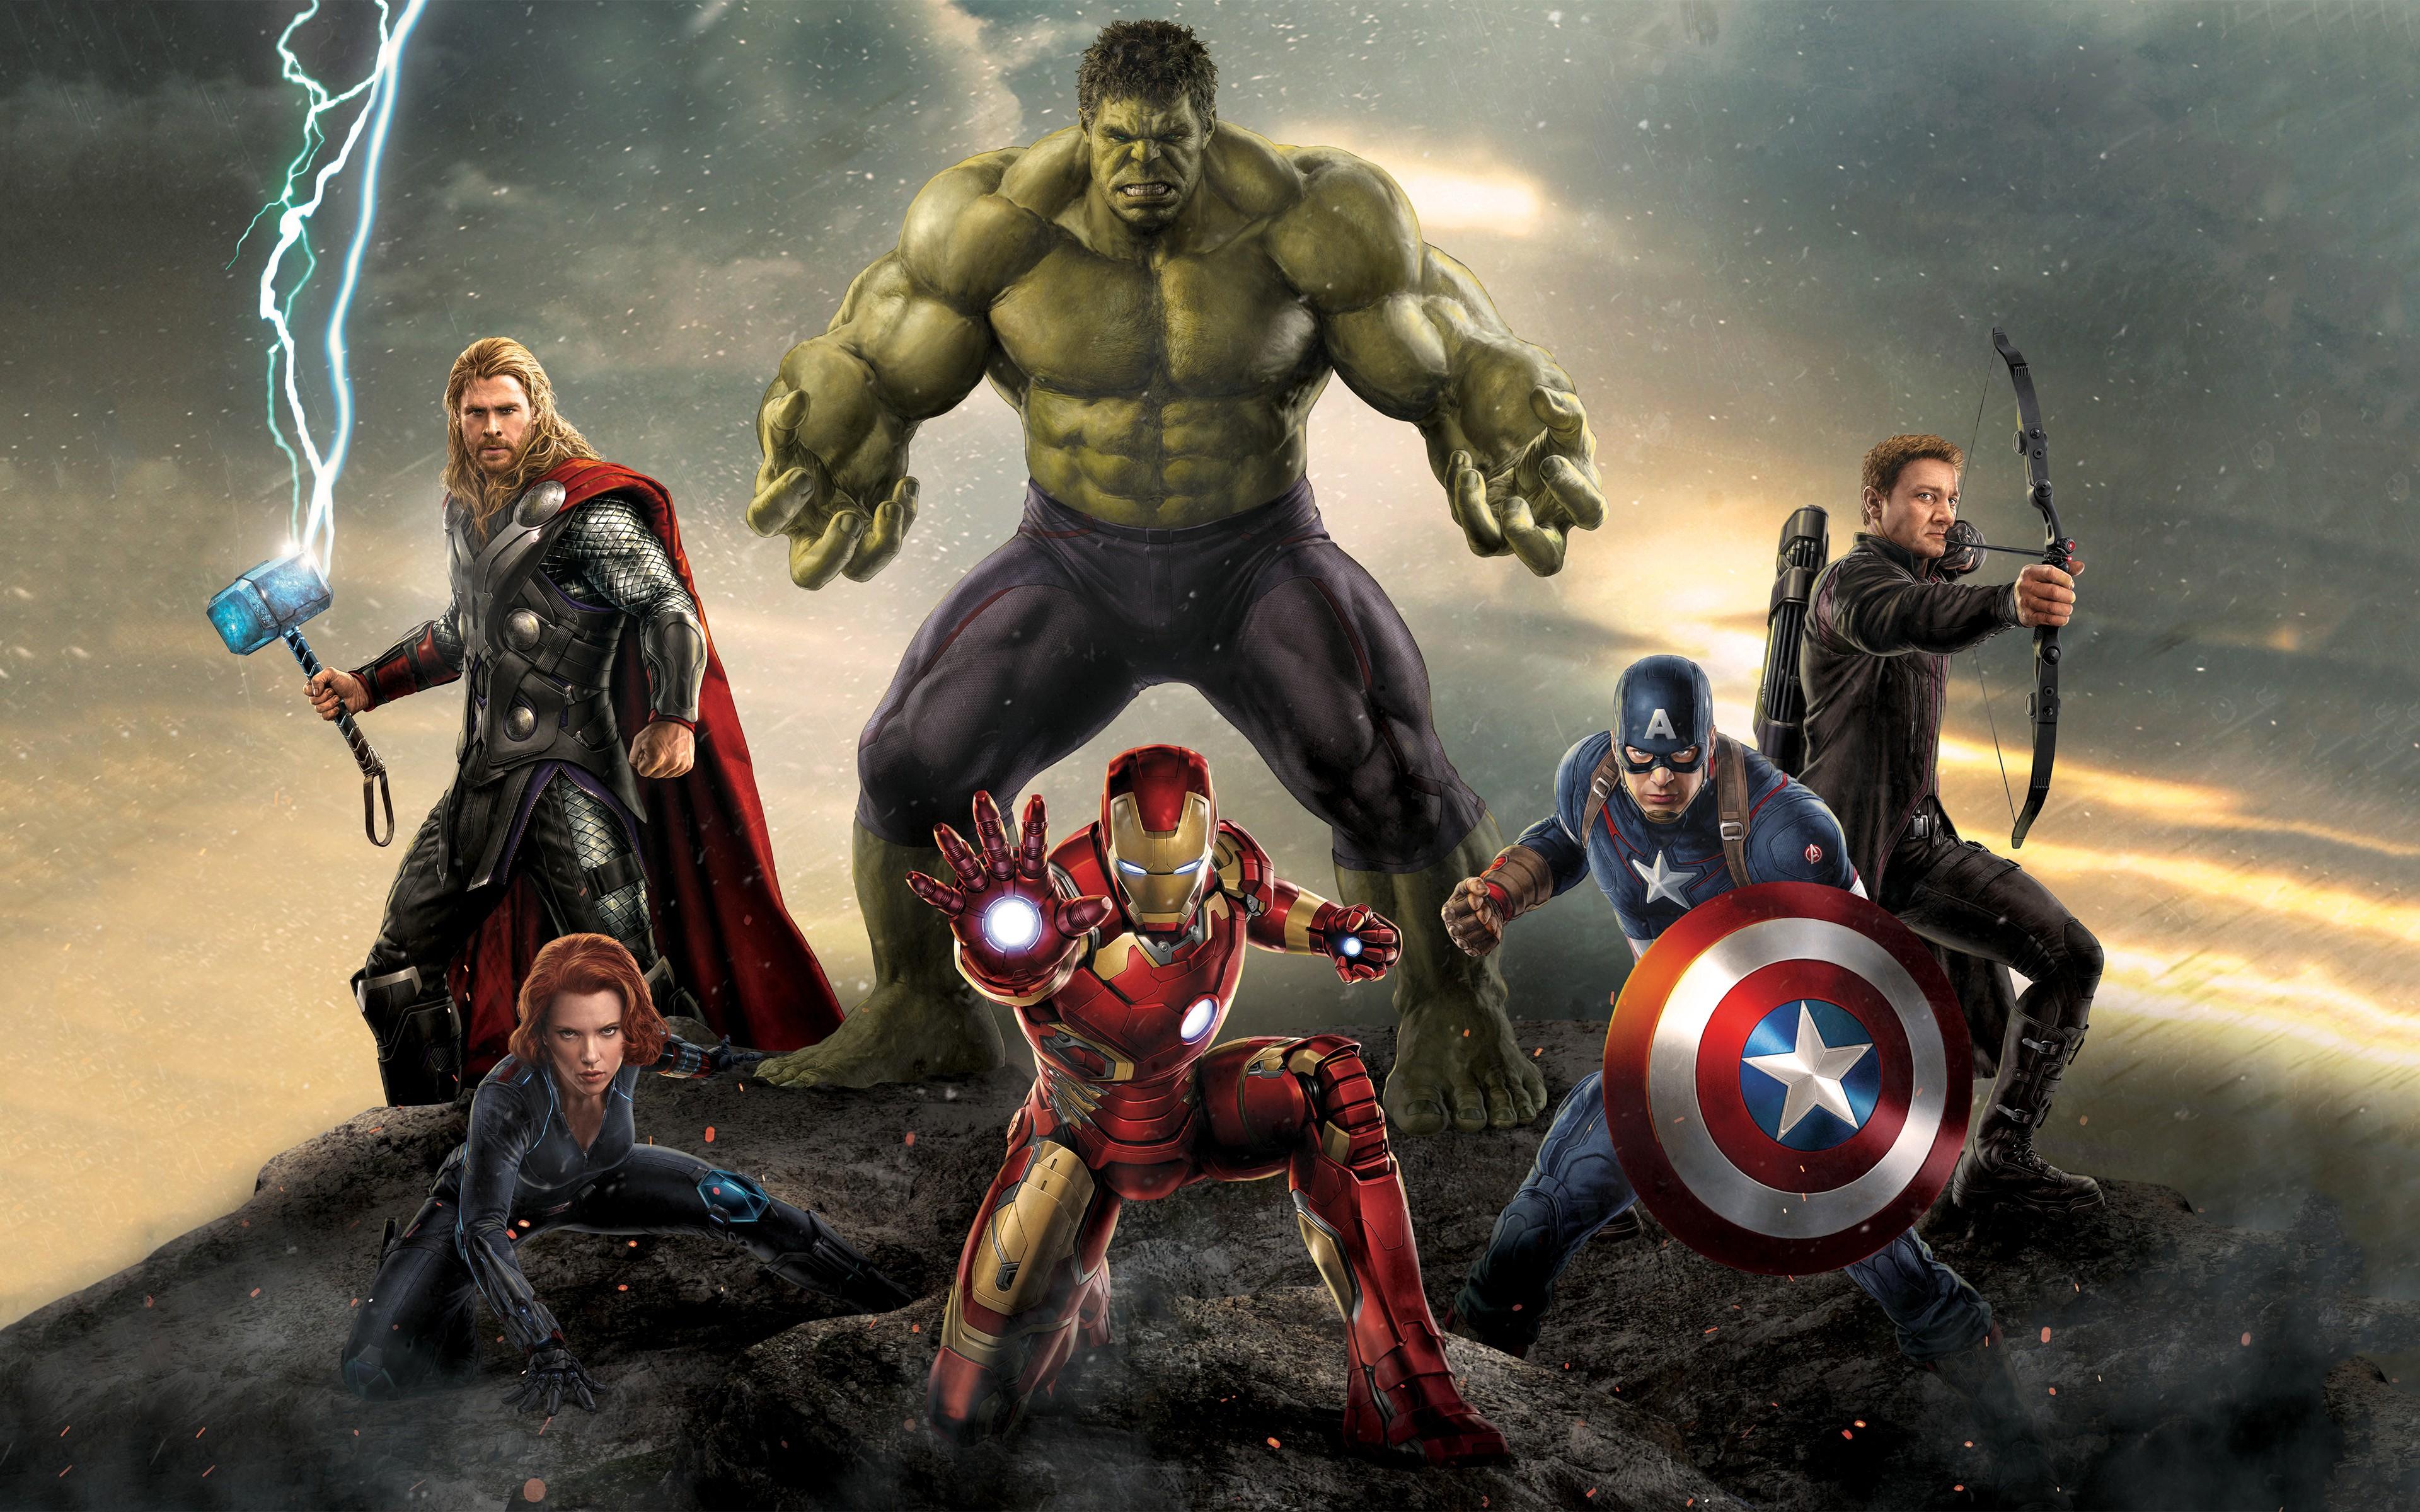 Wallpaper 3840x2400 Px Avengers Age Of Ultron Black Widow Captain America Hawkeye Hulk Iron Man The Avengers Thor 3840x2400 Wallbase 1428767 Hd Wallpapers Wallhere